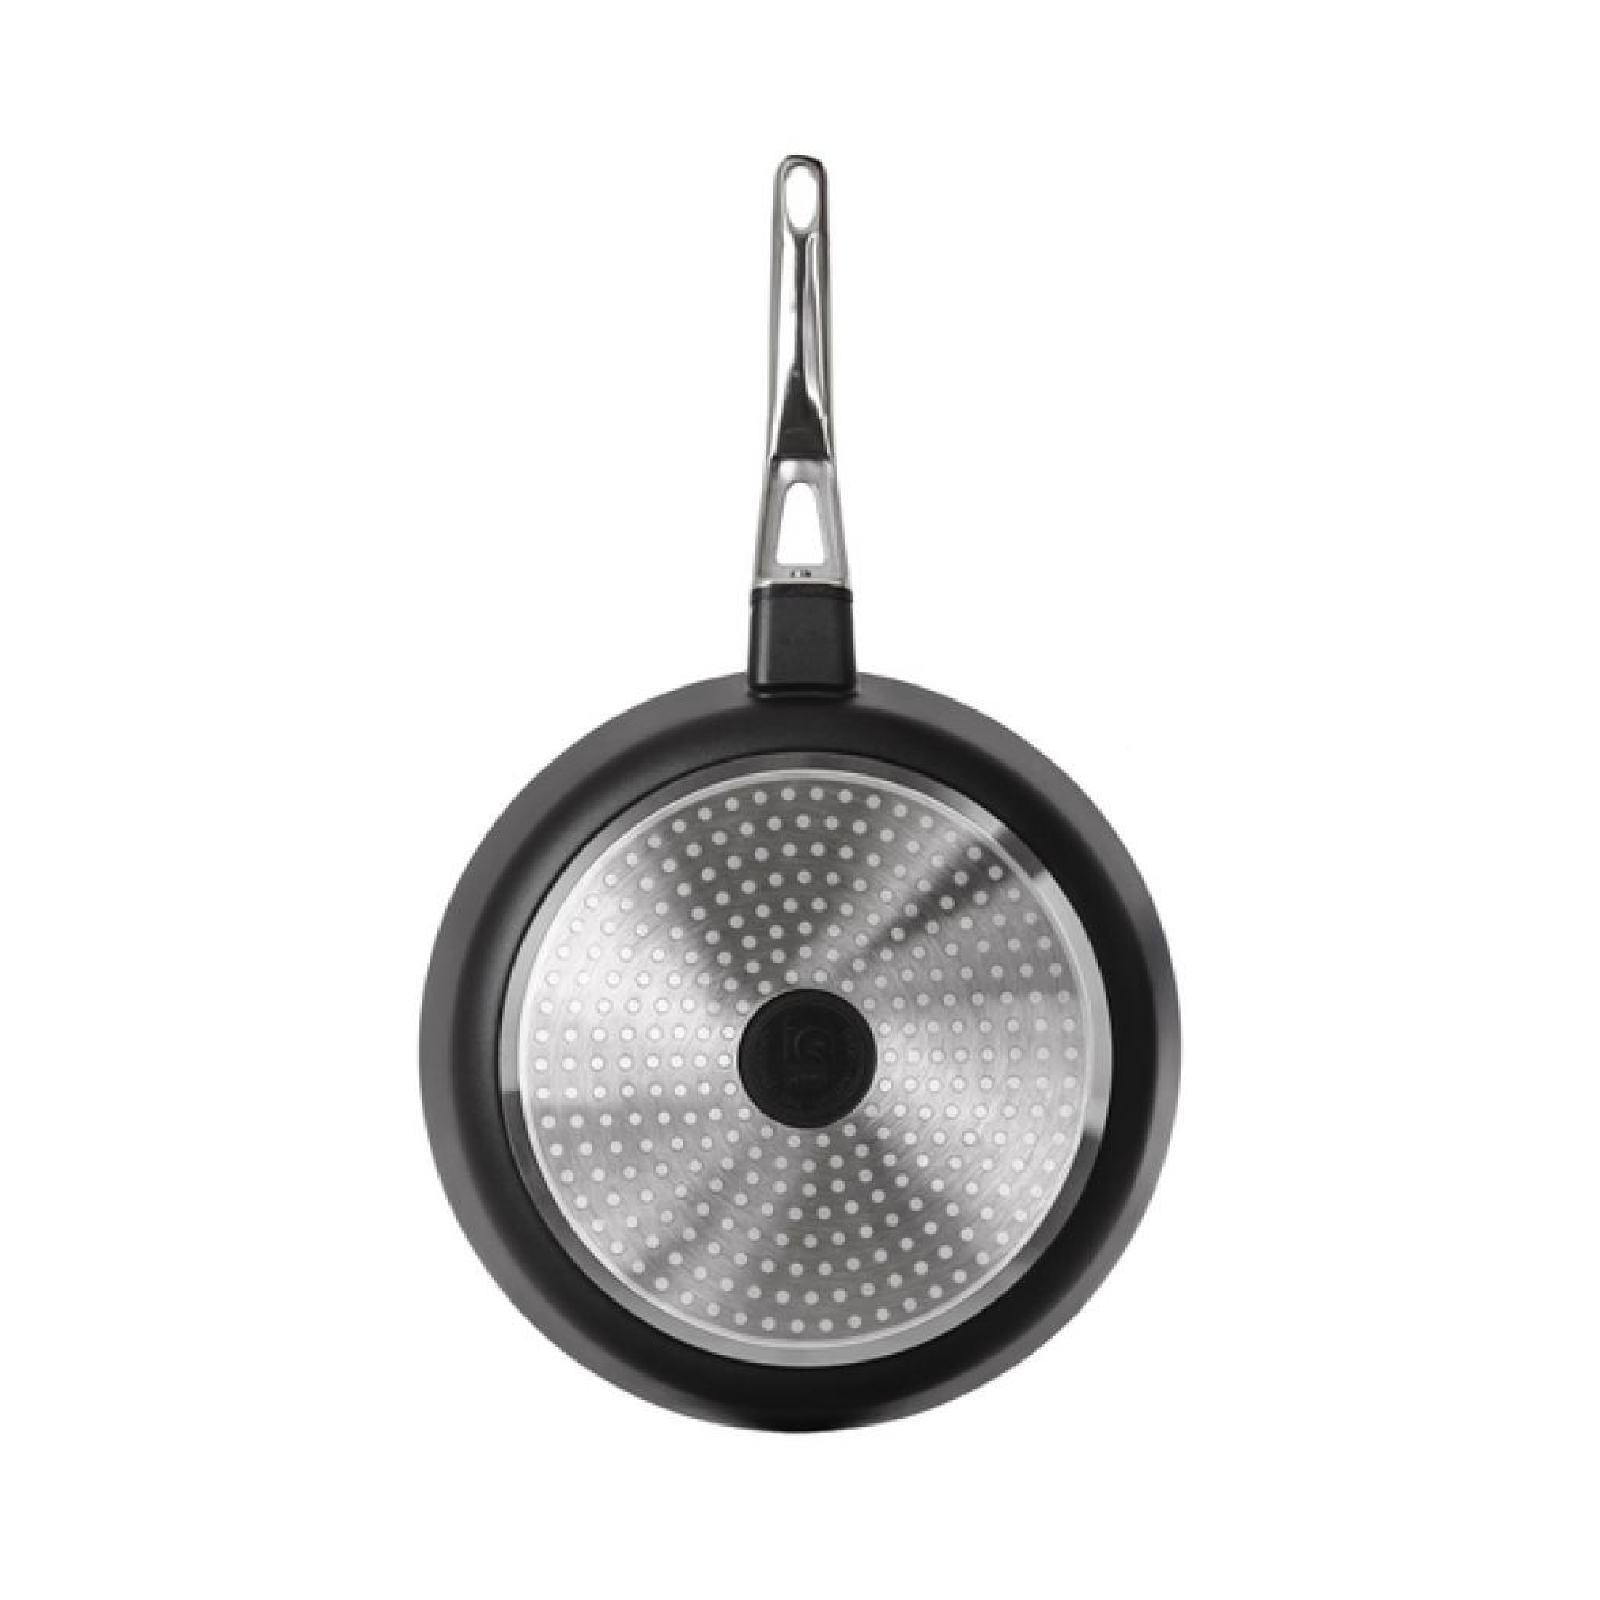 Сковорода Ringel IQ Be Chef 28 см (RG-1126-28) изображение 4